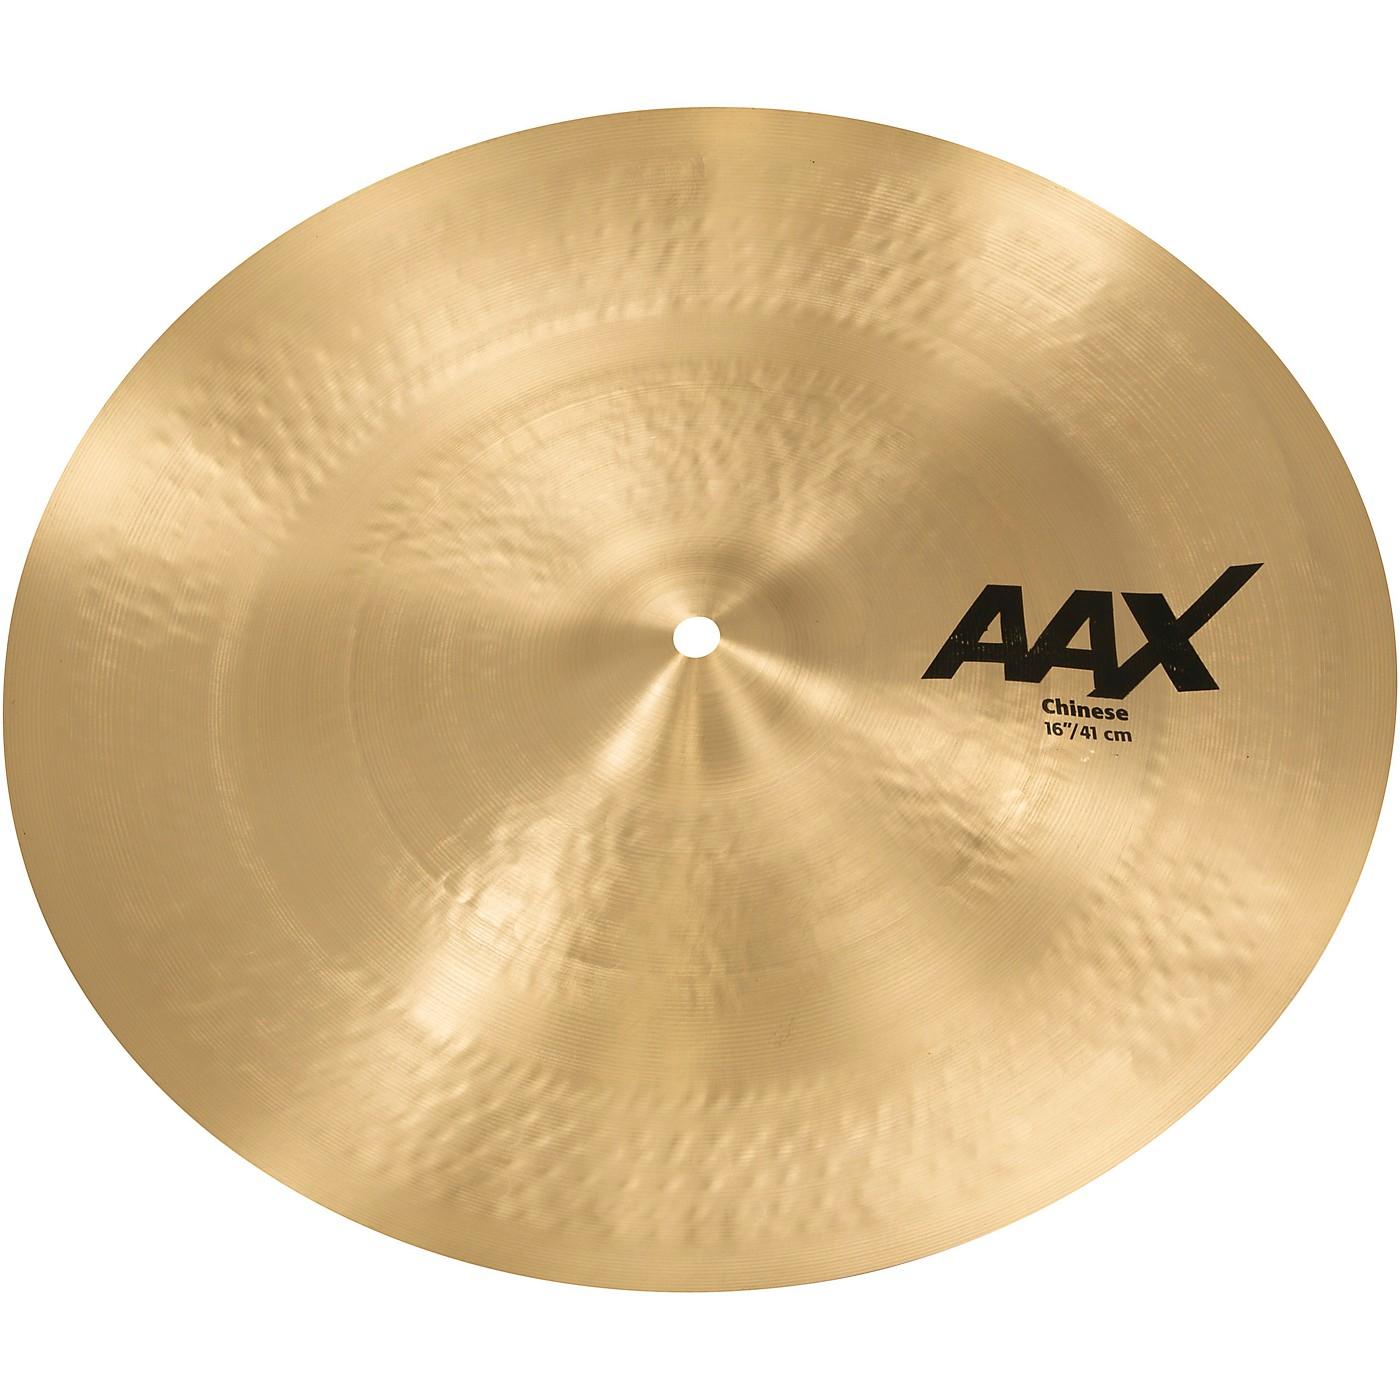 Sabian AAX Series Chinese Cymbal thumbnail